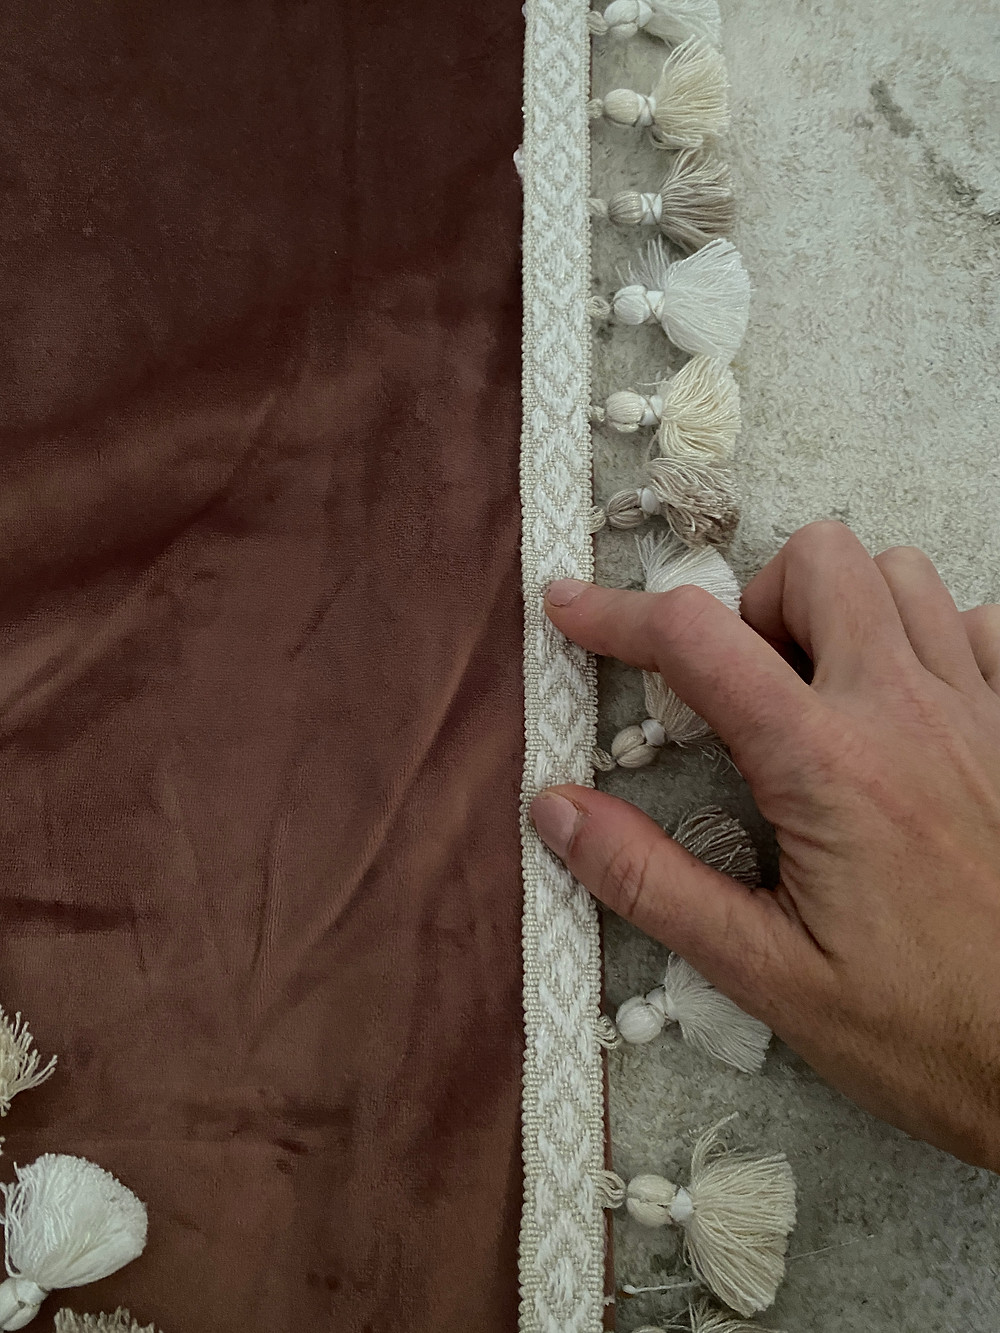 liquid stitch to apply trim to curtains